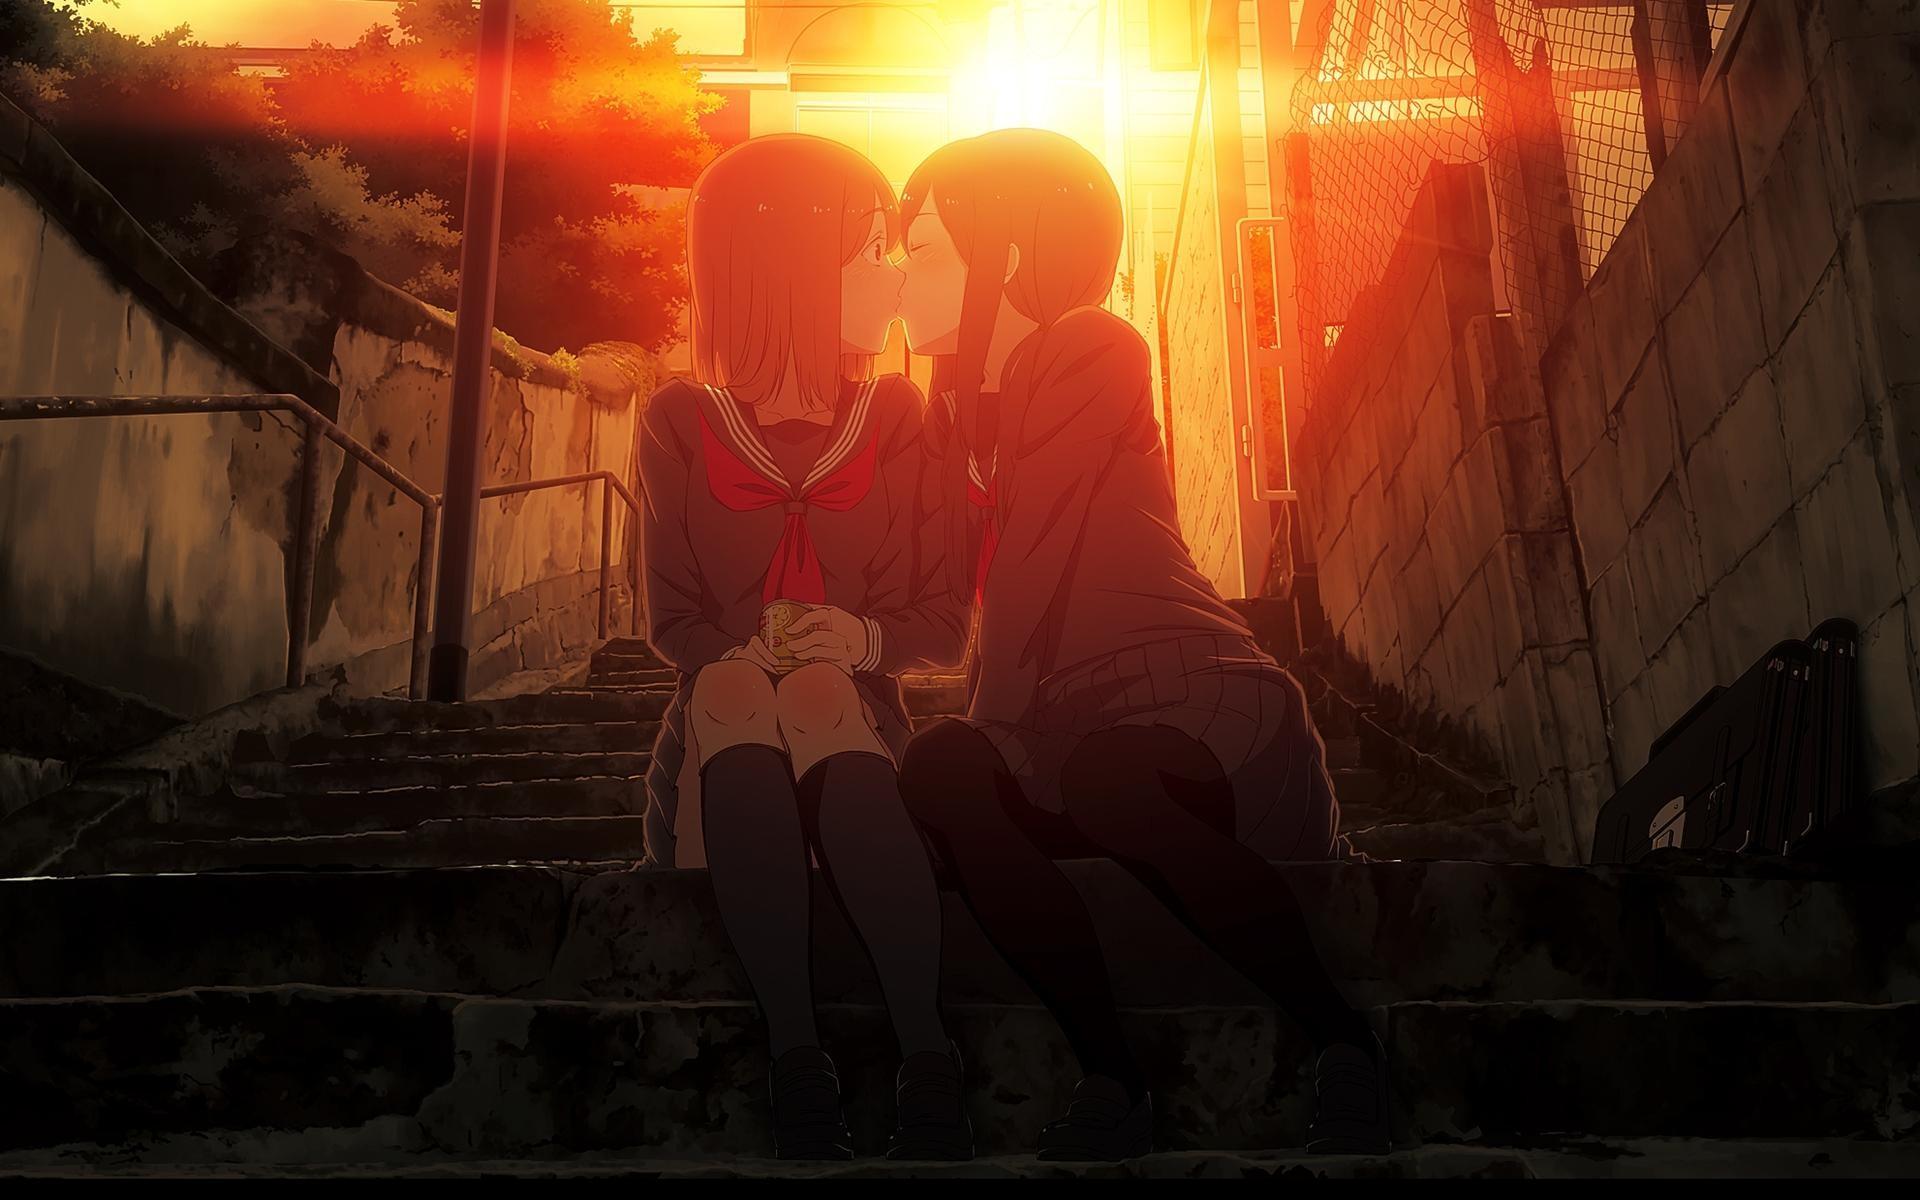 Anime Romance Res: / Size:188kb. Views: 10217